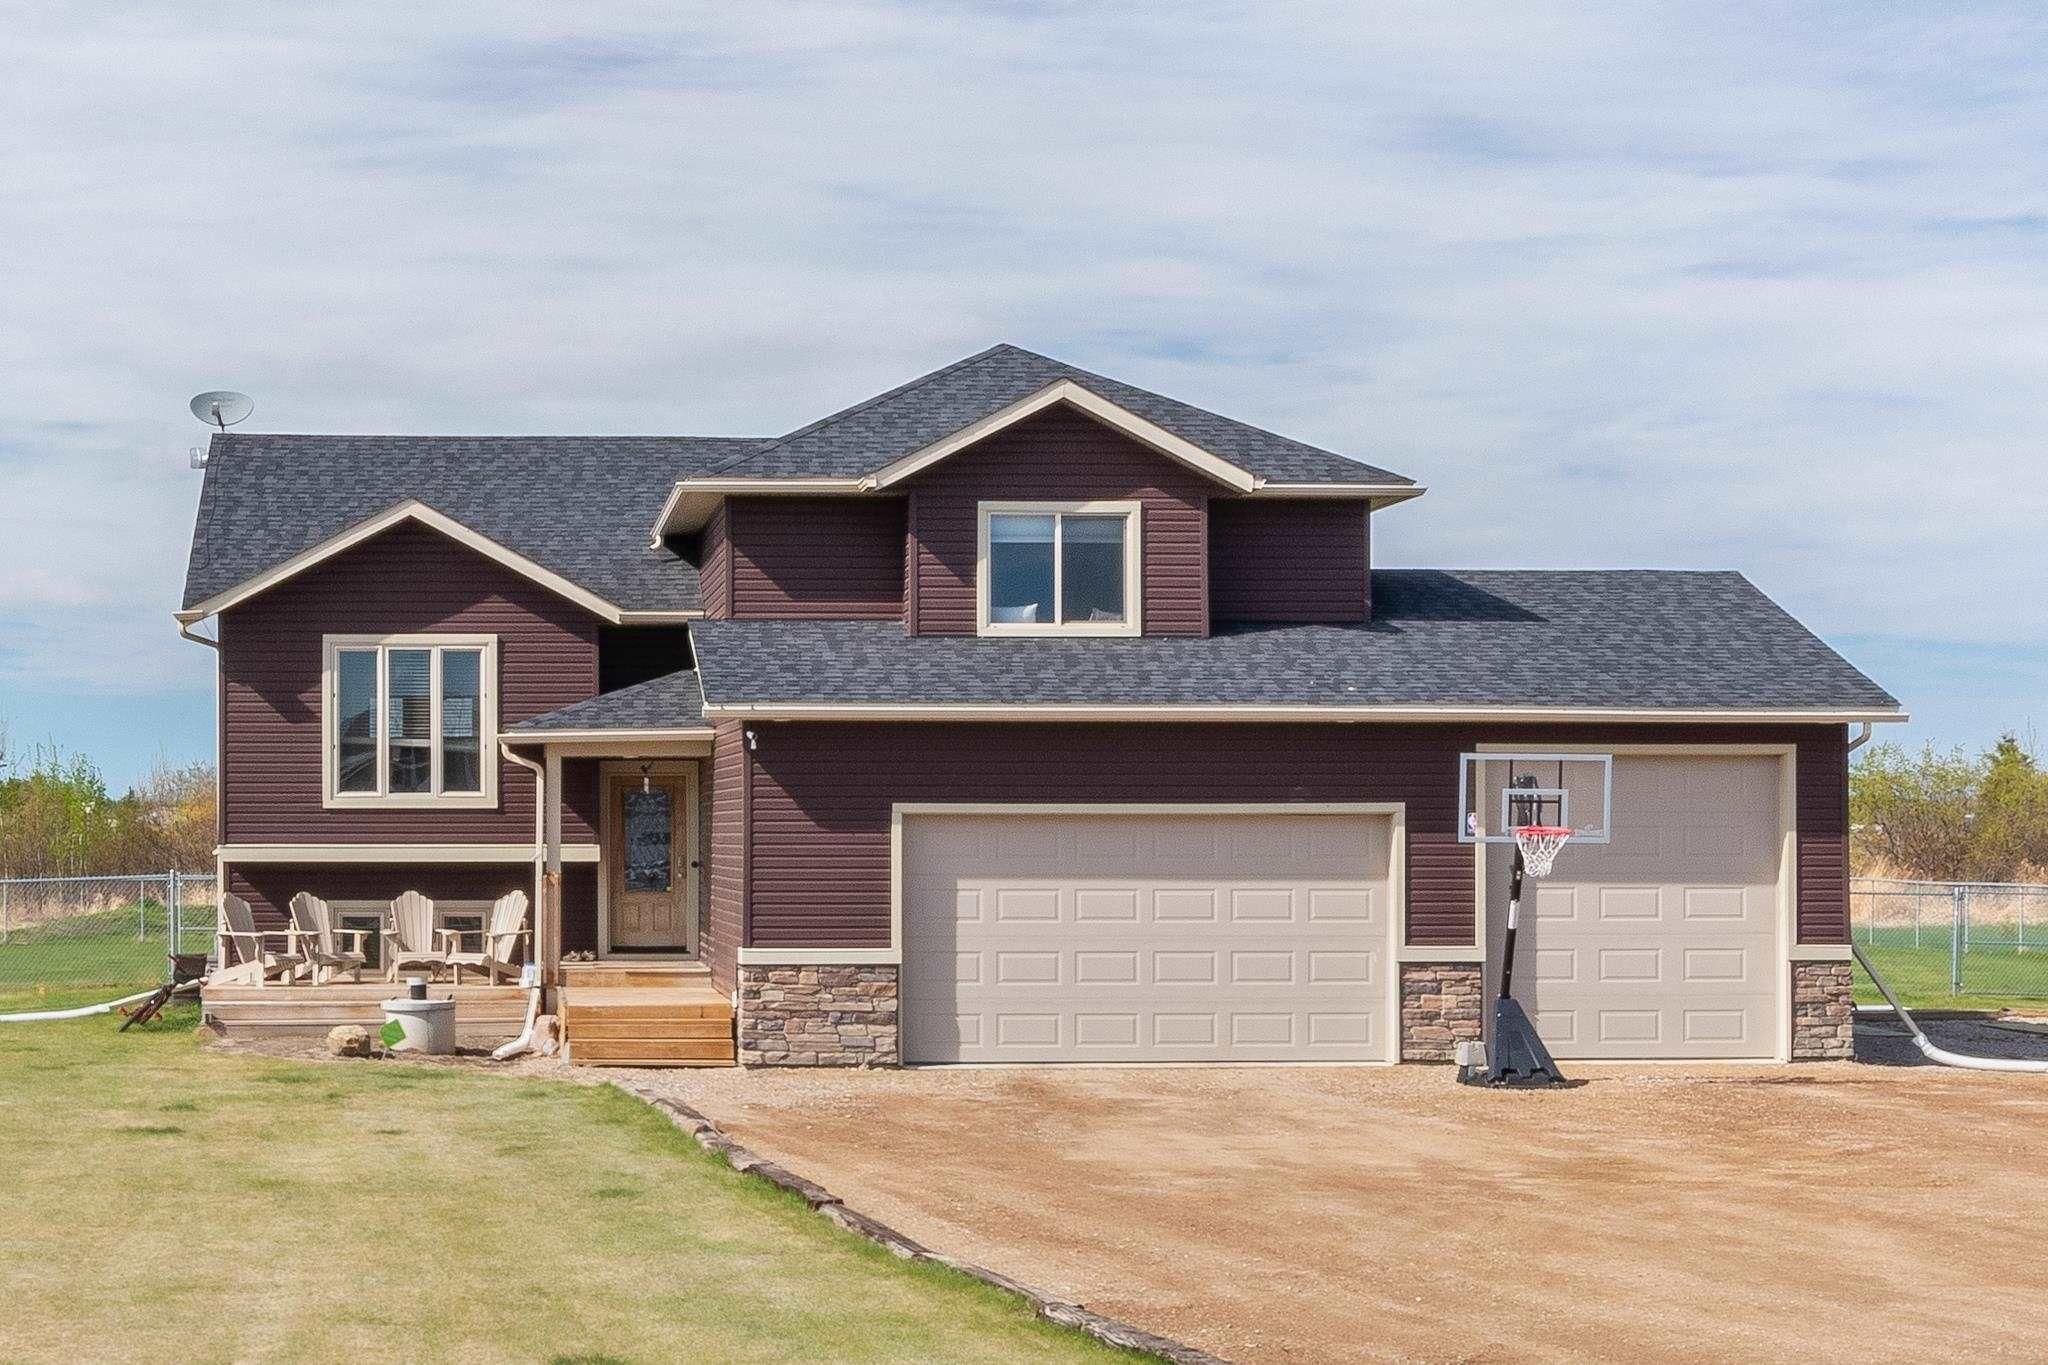 Main Photo: 42230 TWP 632: Rural Bonnyville M.D. House for sale : MLS®# E4232378